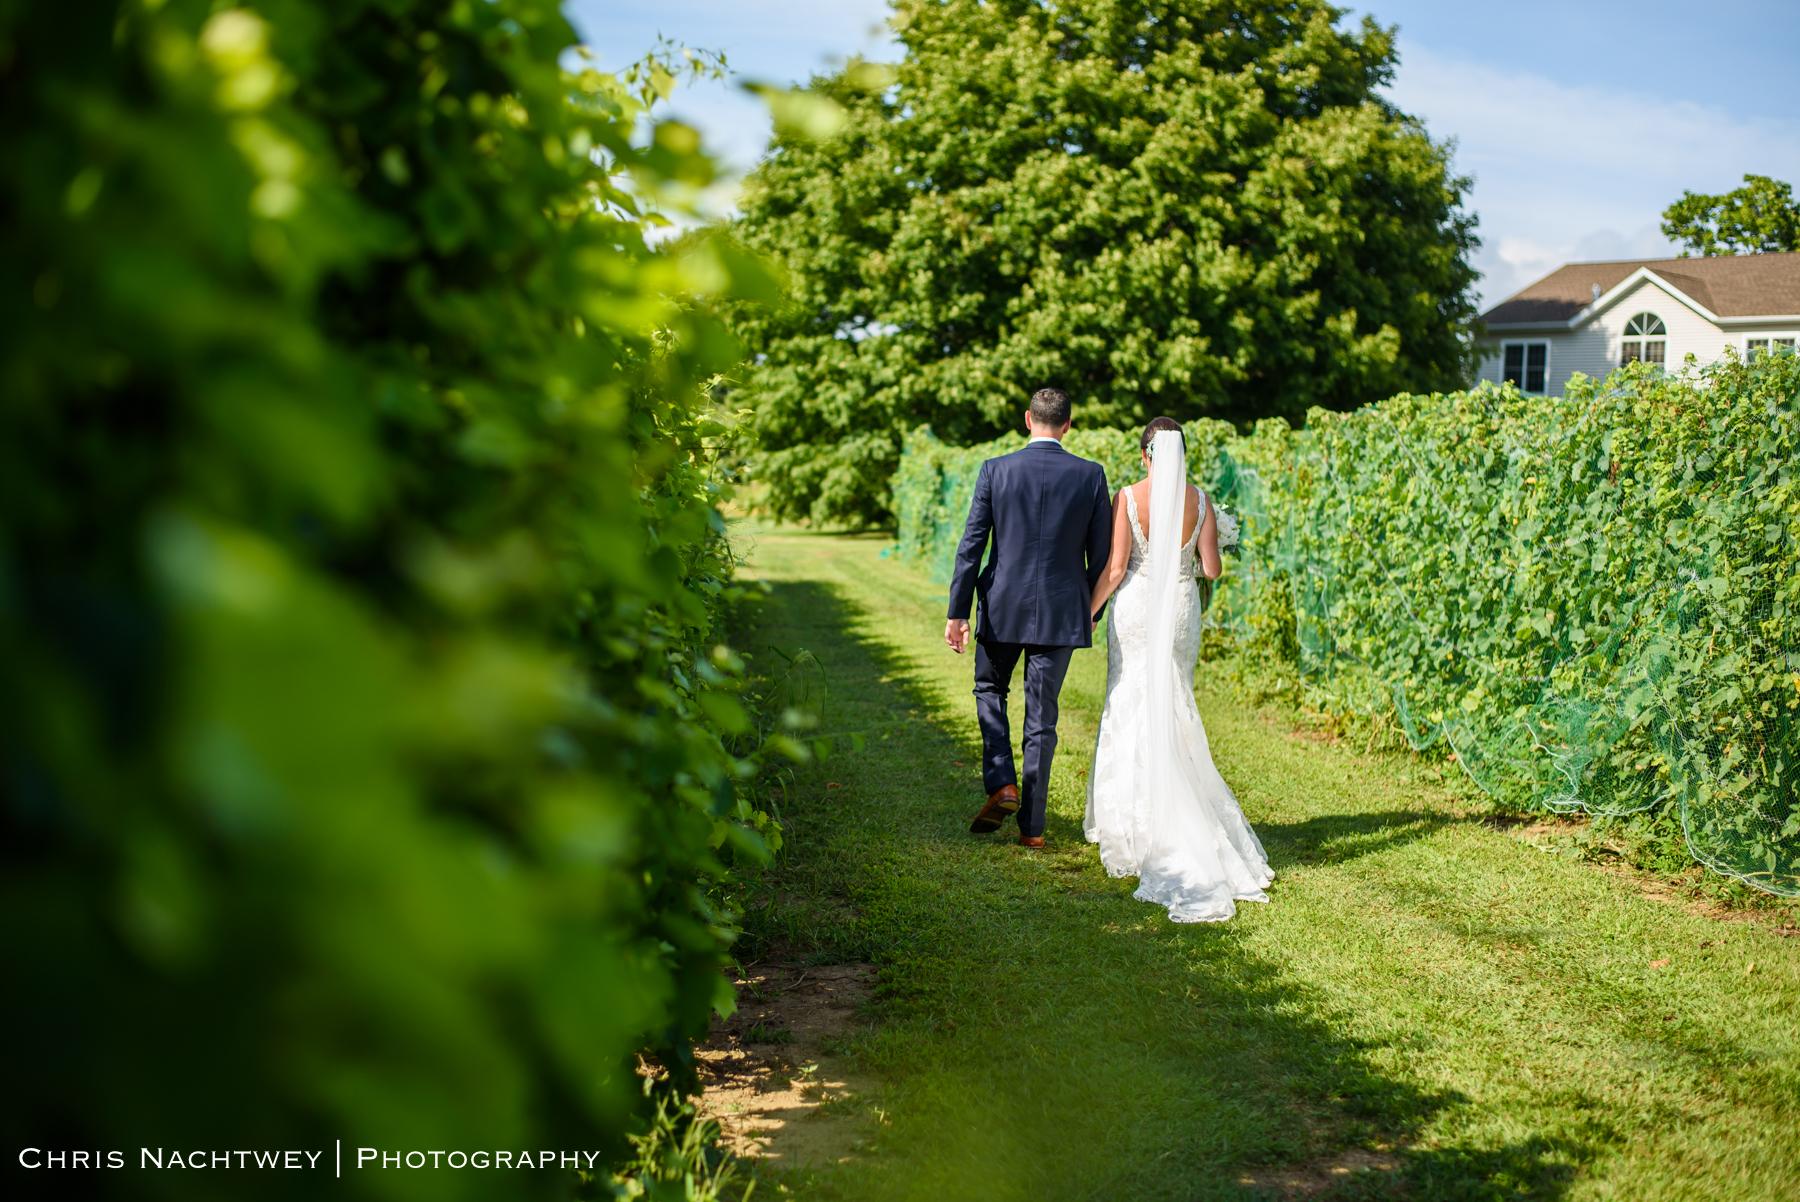 wedding-lake-of-isles-photos-chris-nachtwey-photography-2019-16.jpg